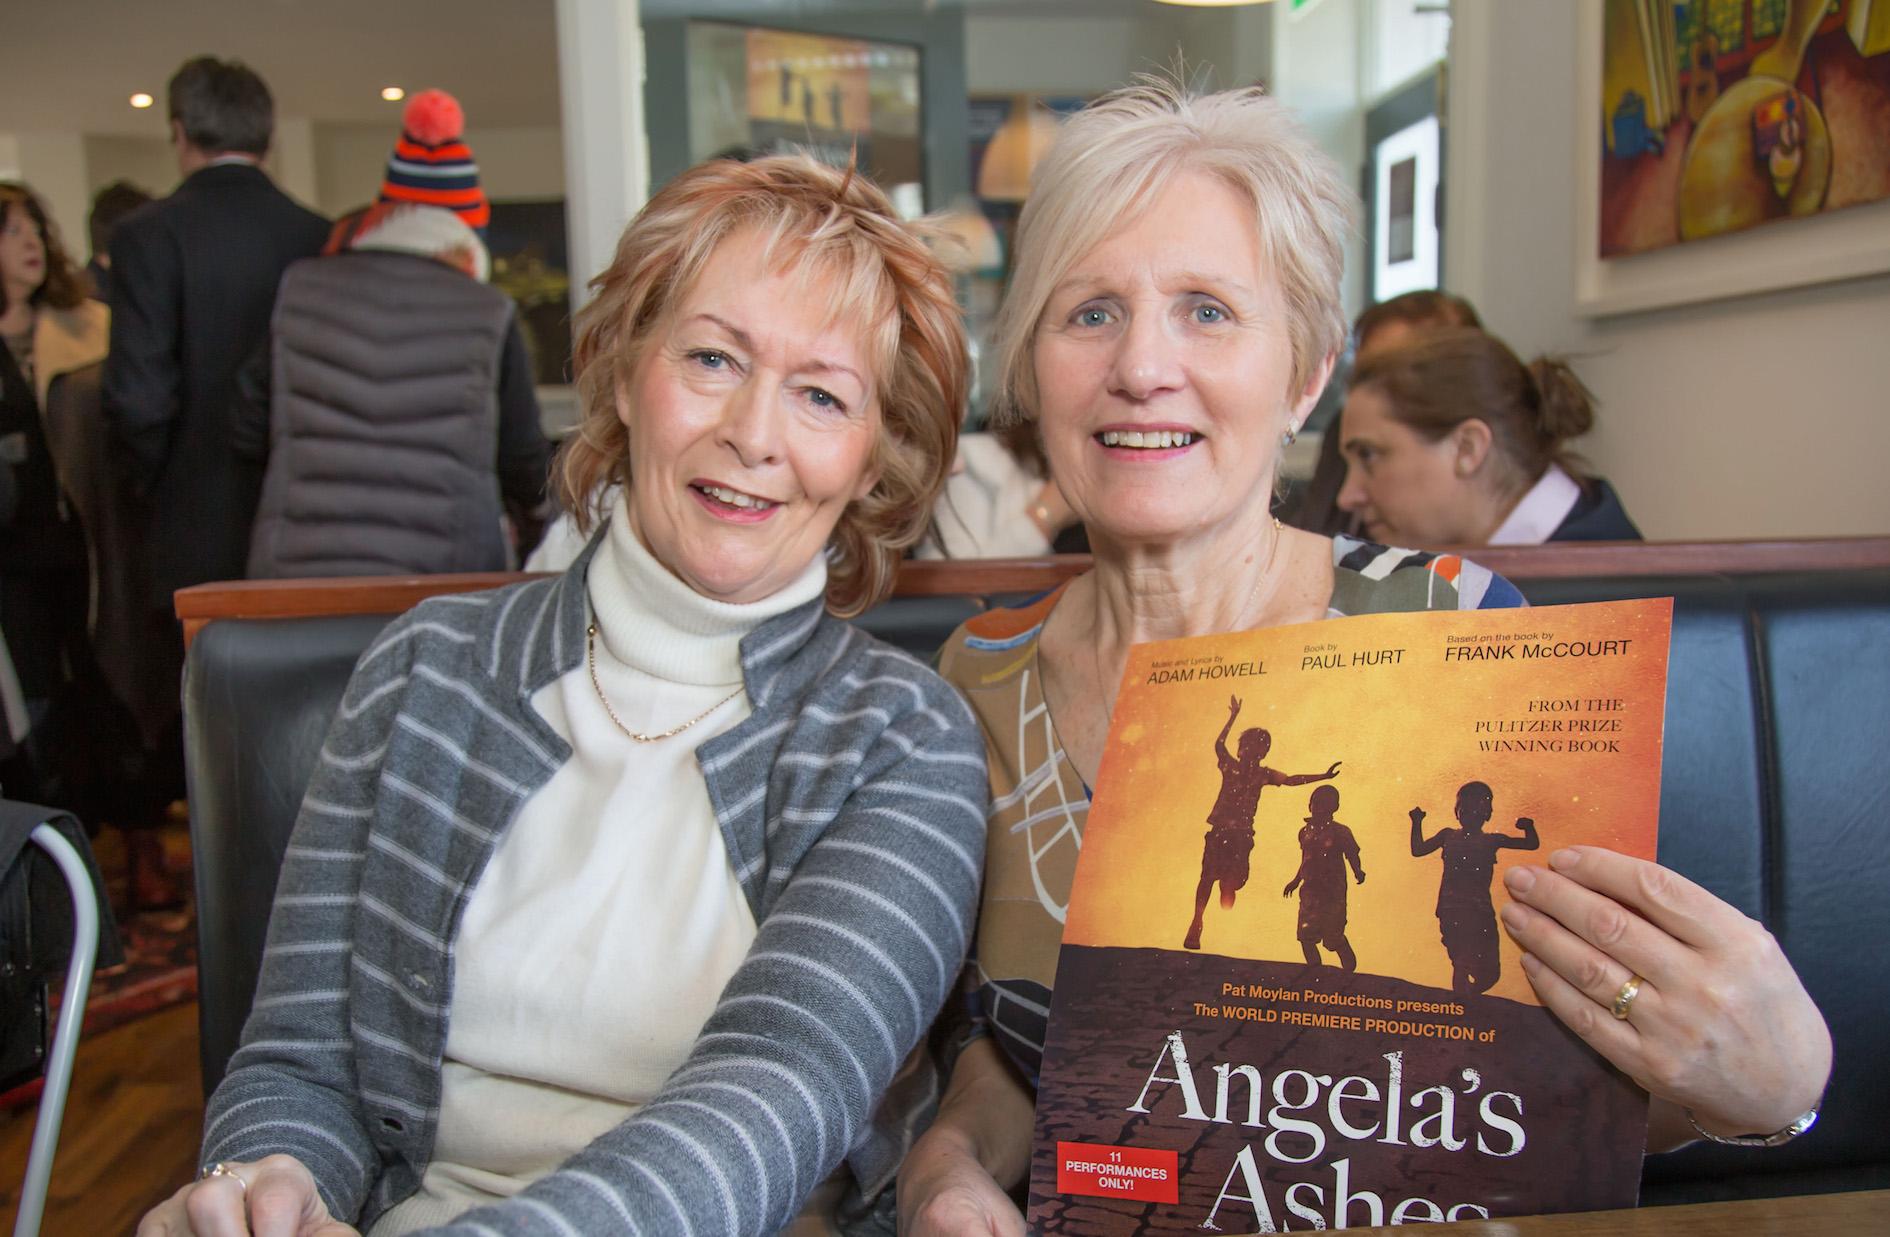 Angelas Ashes Musical